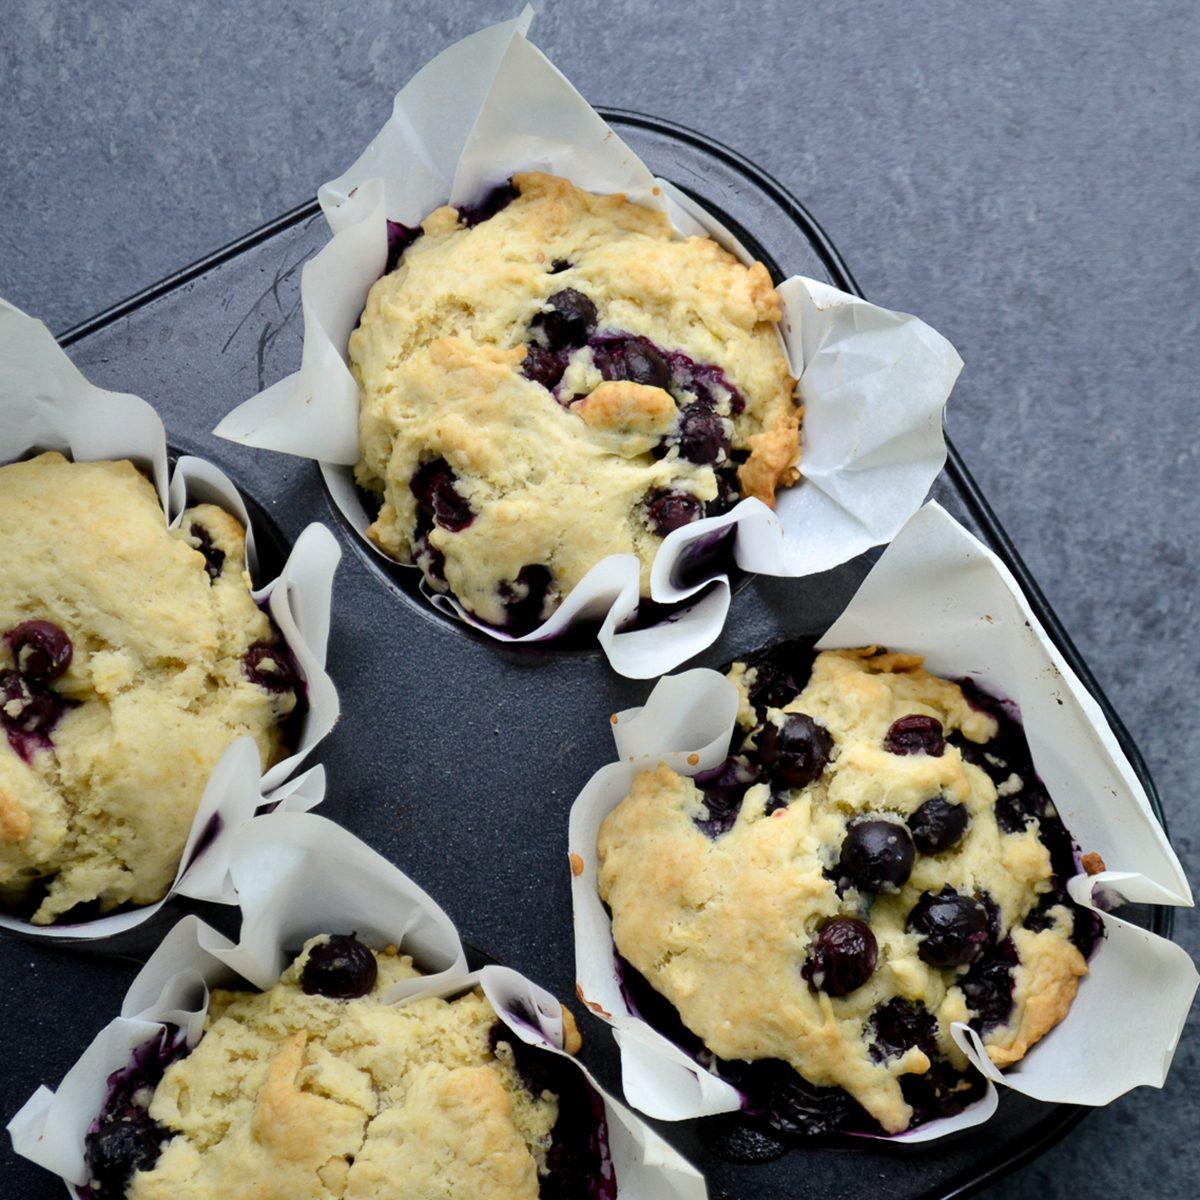 Delightful Vegan Blueberry Muffins